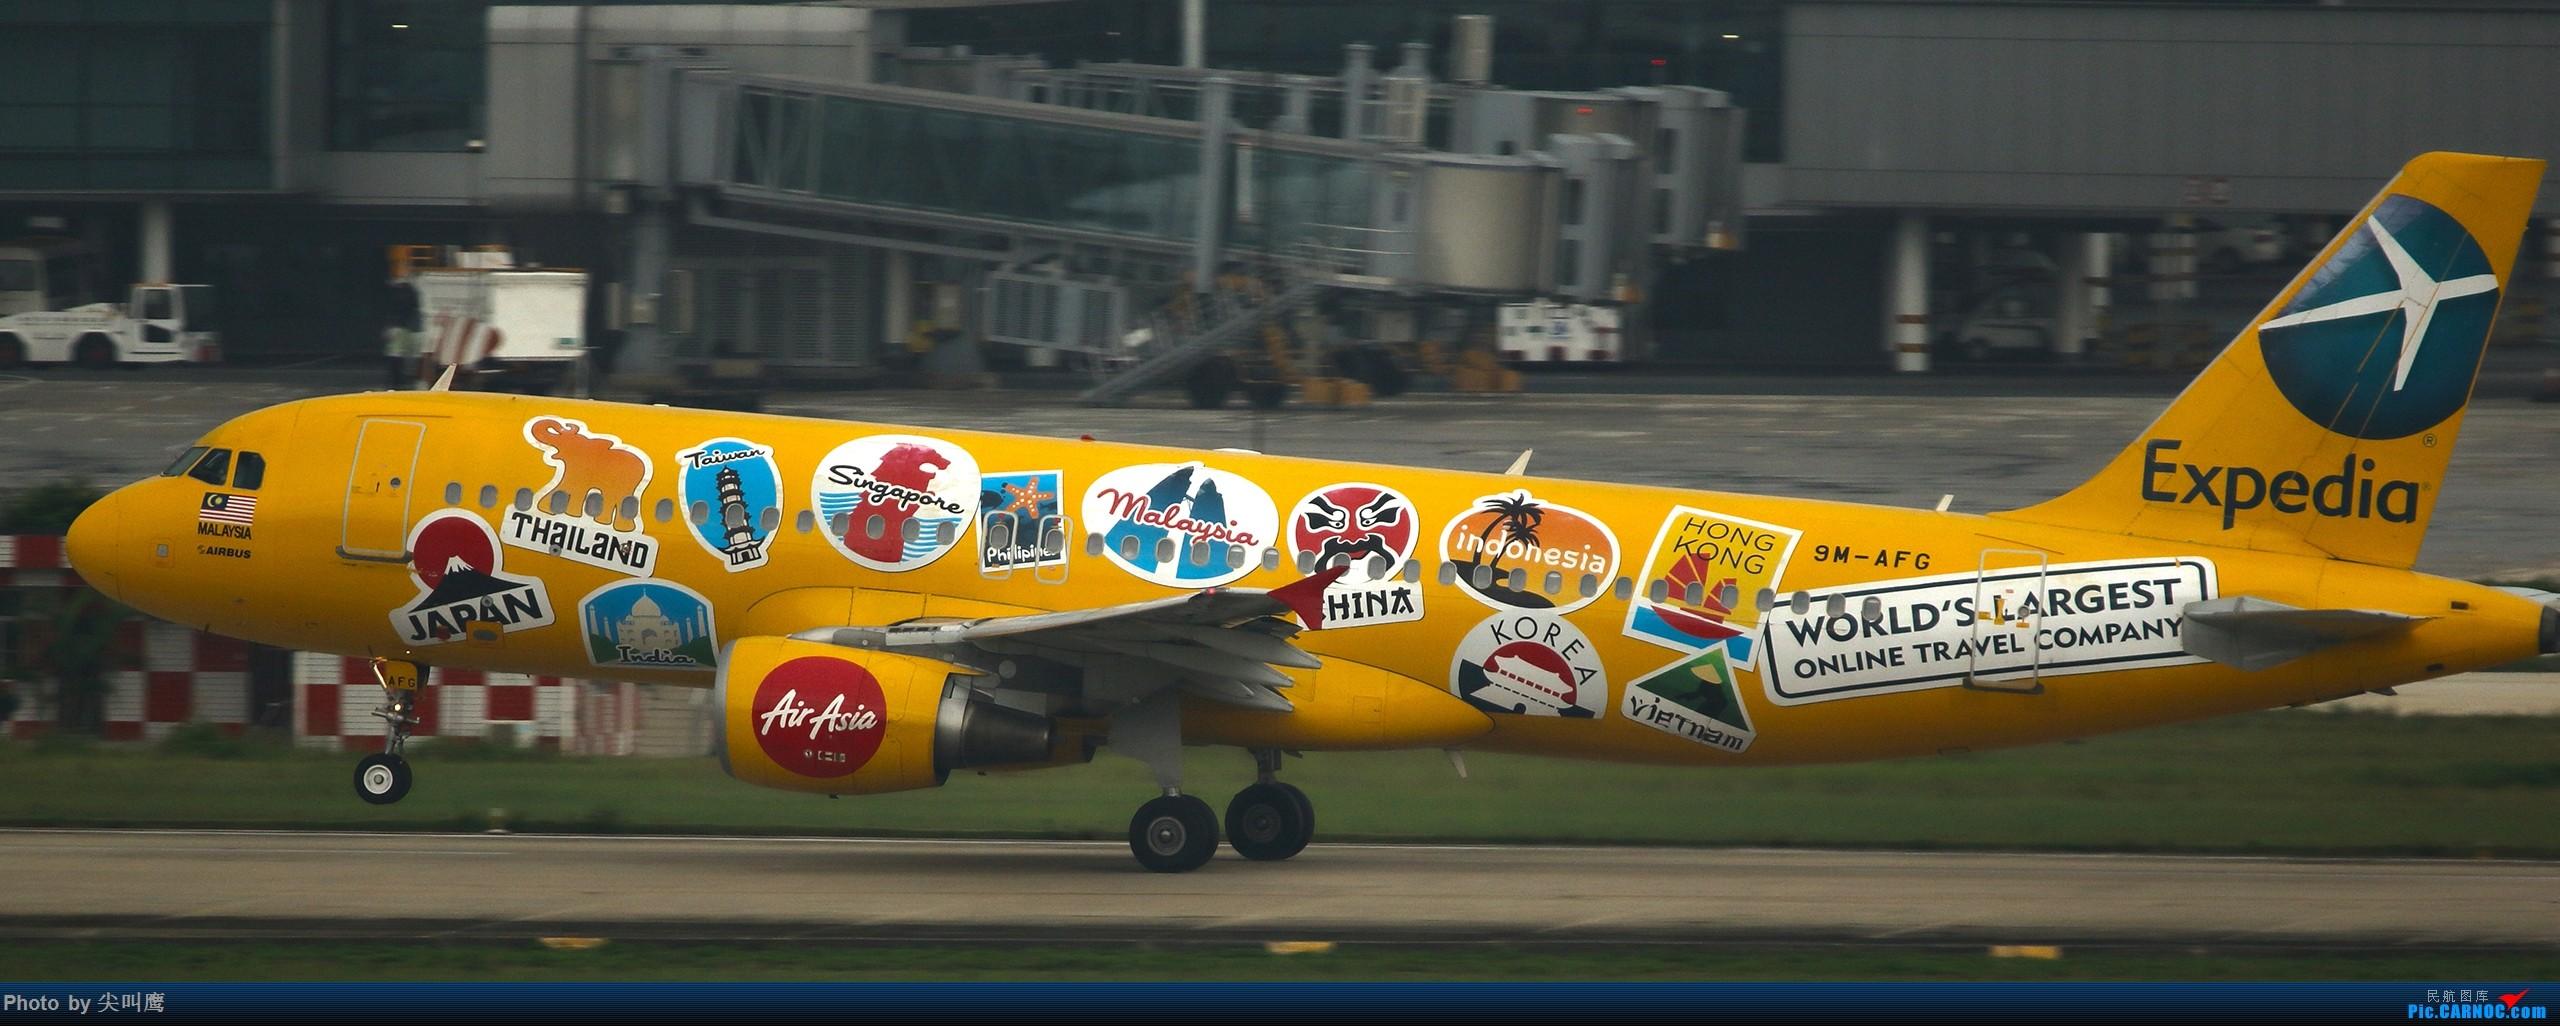 Re:[原创]NNG的亚航小合集 AIRBUS A320 9M-AFG 中国南宁吴圩国际机场